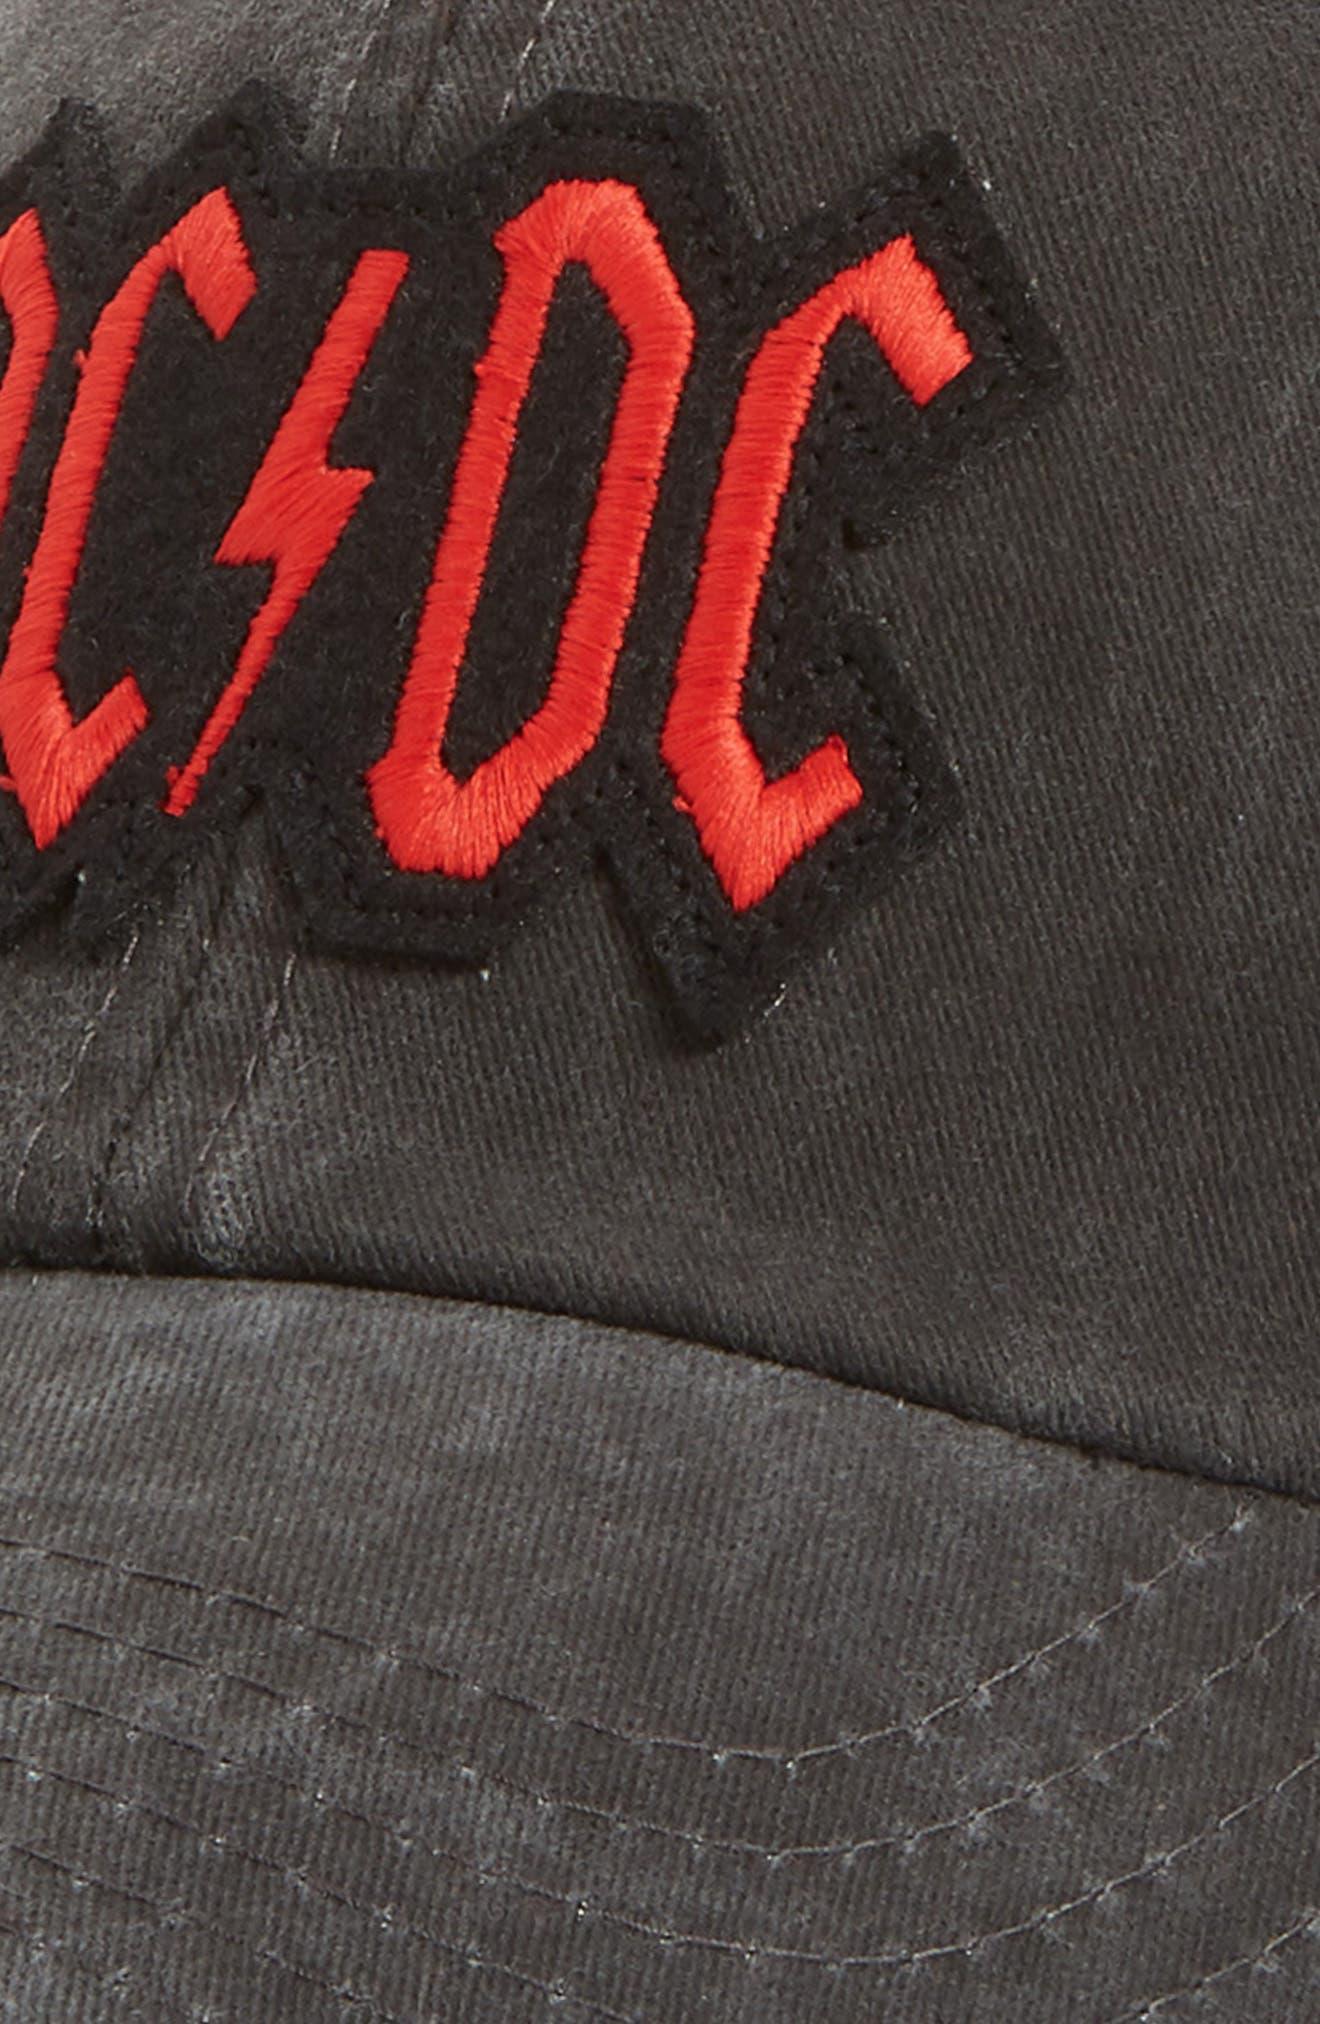 Raglan Bones AC/DC Ball Cap,                             Alternate thumbnail 3, color,                             Black